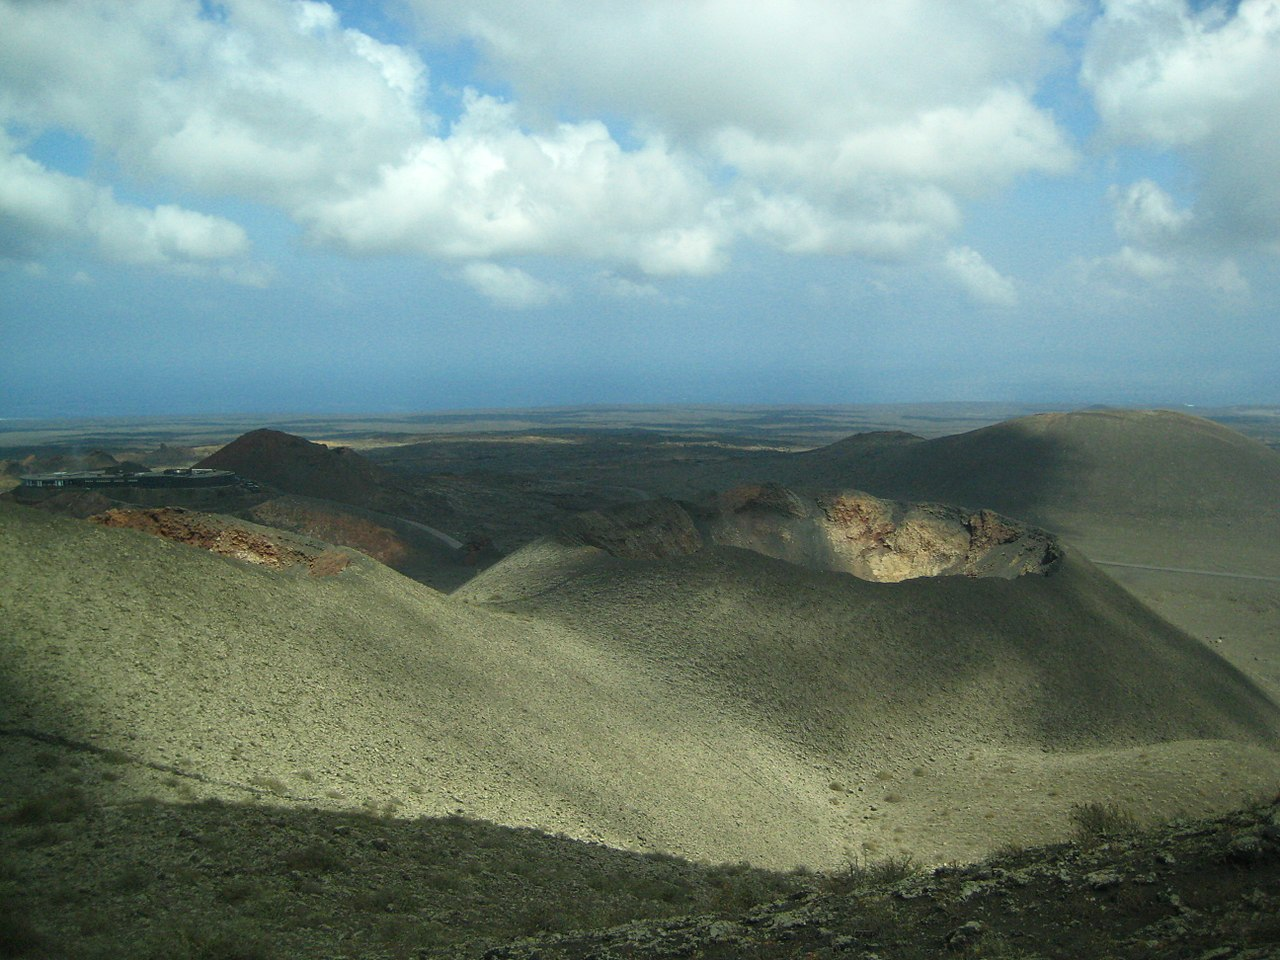 1280px-timanfaya_boca_volcan.JPG